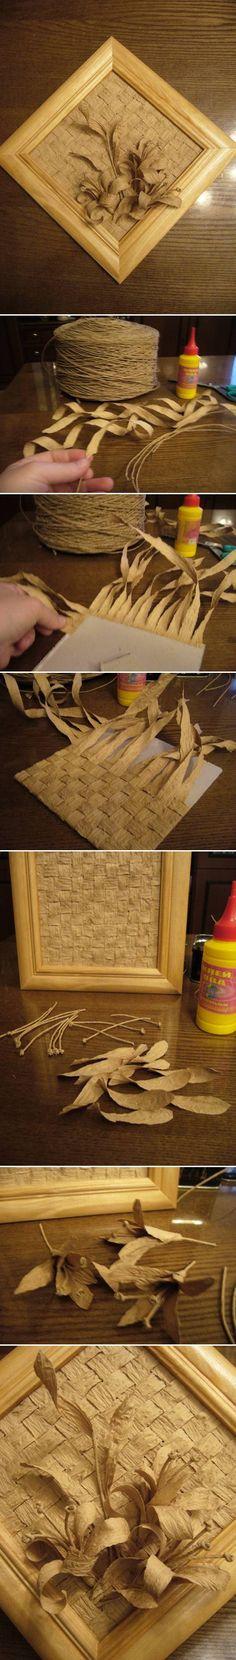 DIY Paper Twine Panel